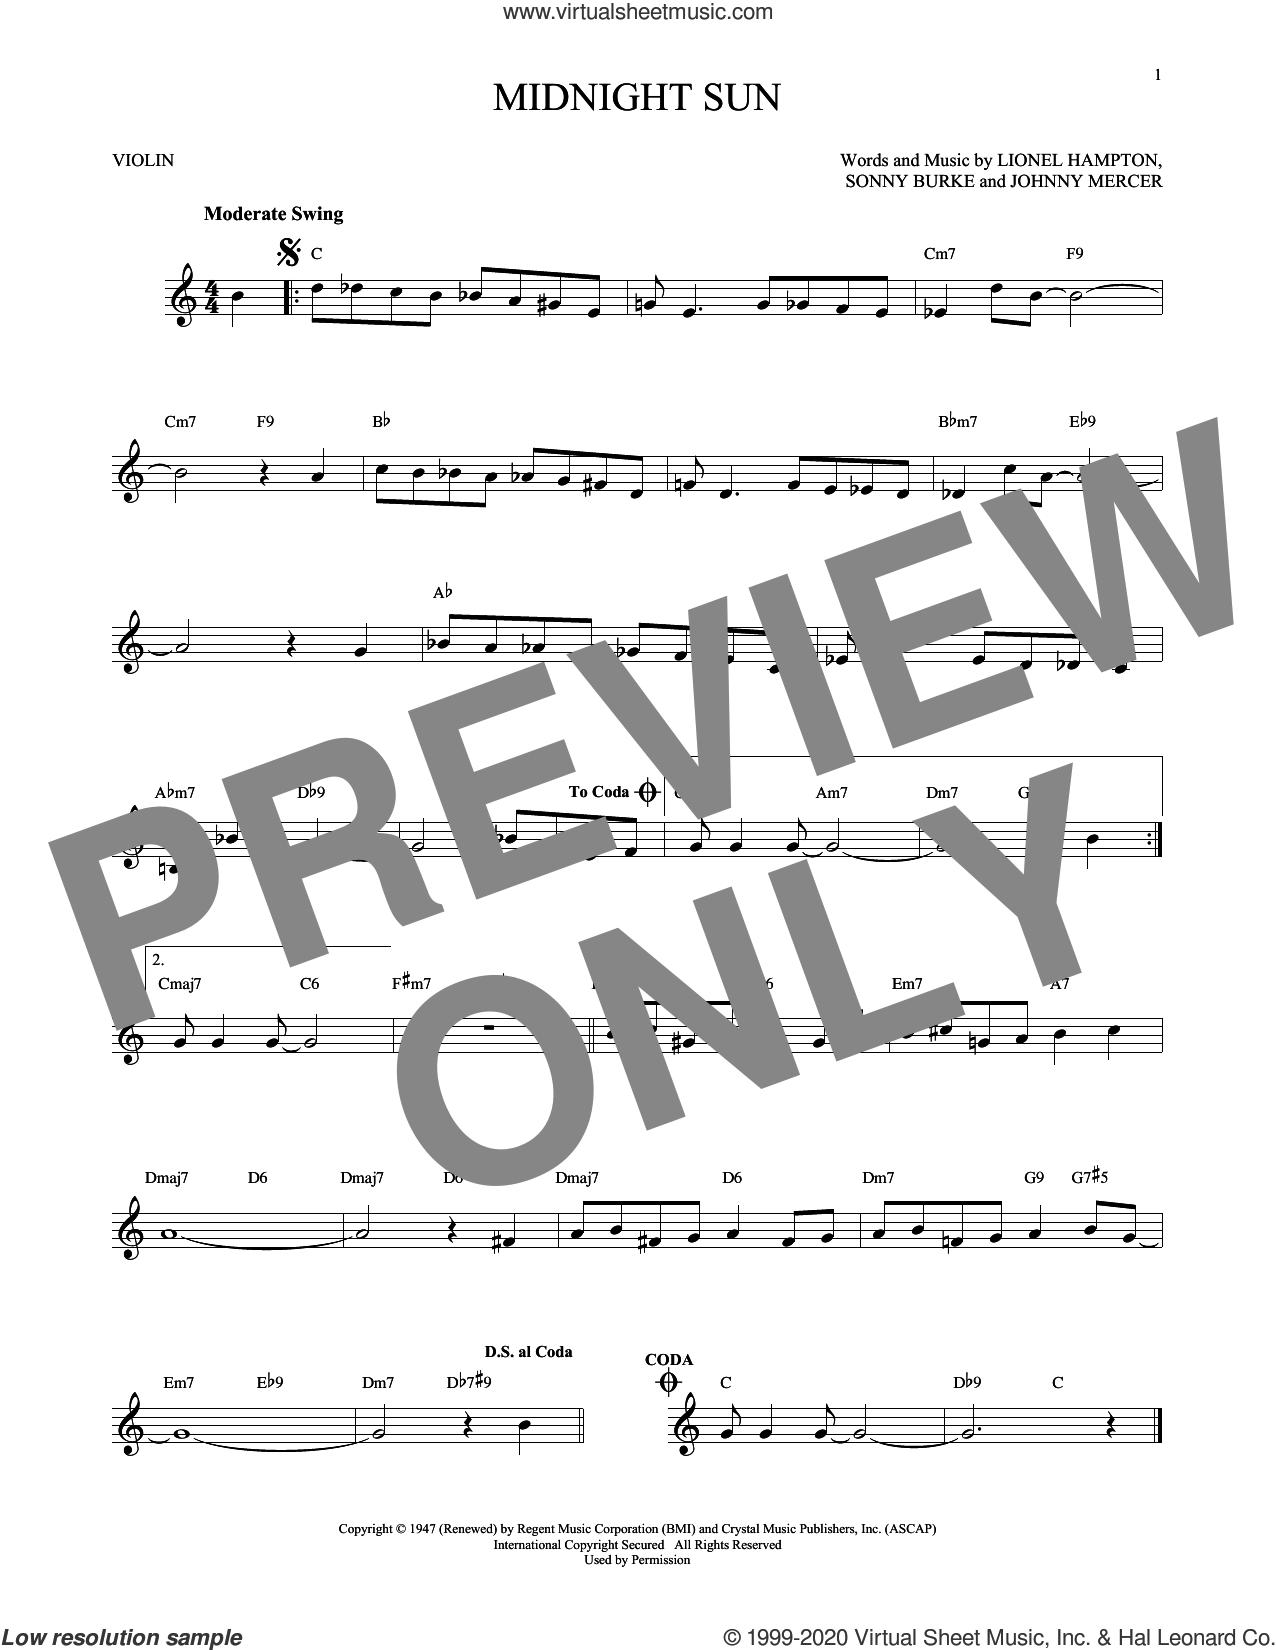 Midnight Sun sheet music for violin solo by Johnny Mercer, Lionel Hampton and Sonny Burke, intermediate skill level